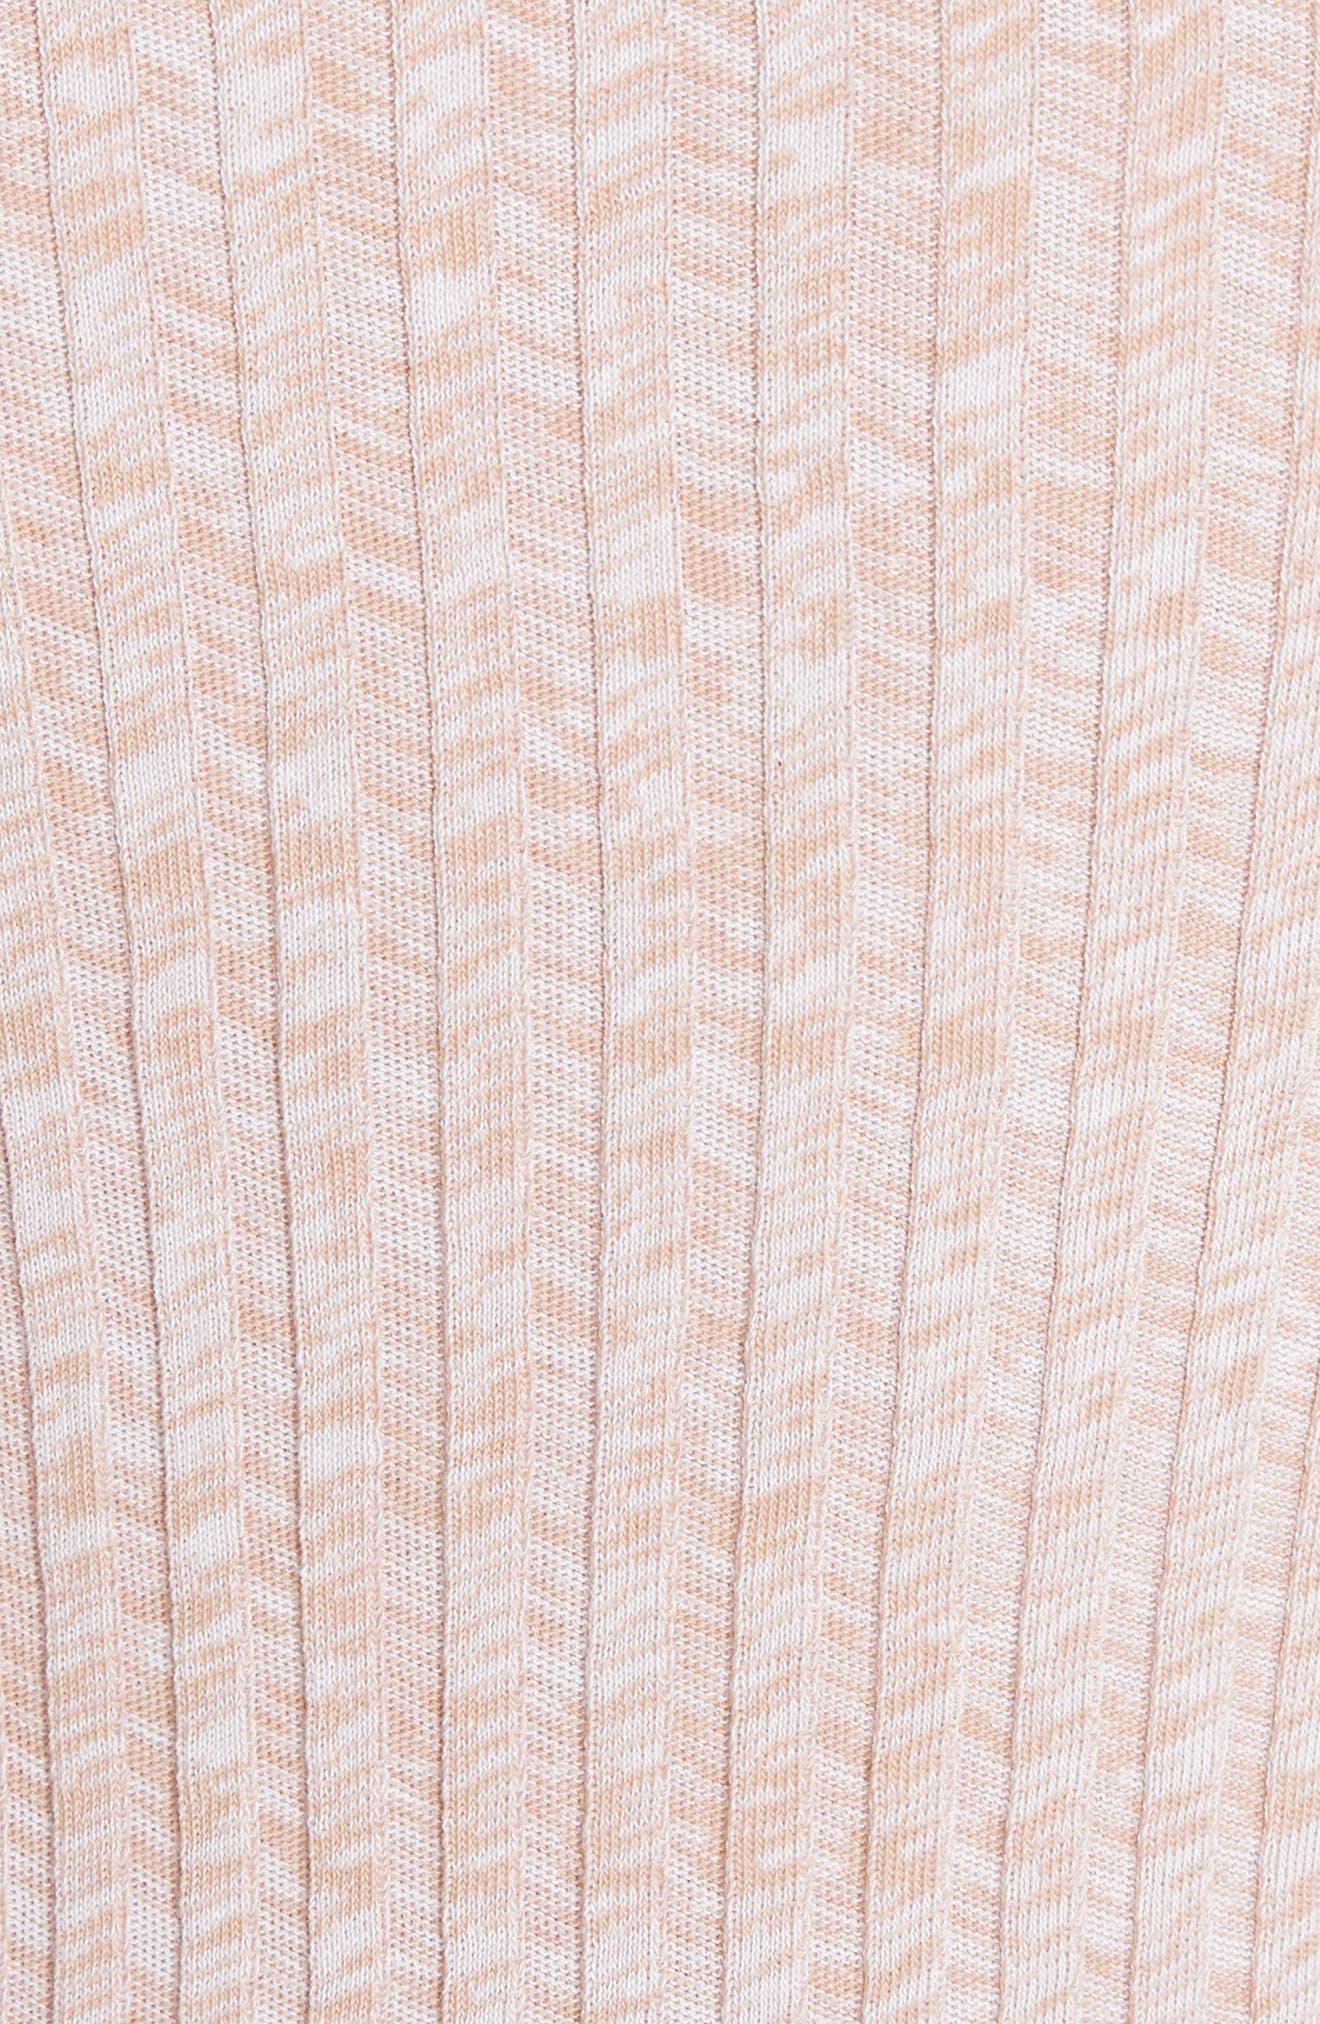 Marled Rib Knit Crewneck Sweater,                             Alternate thumbnail 10, color,